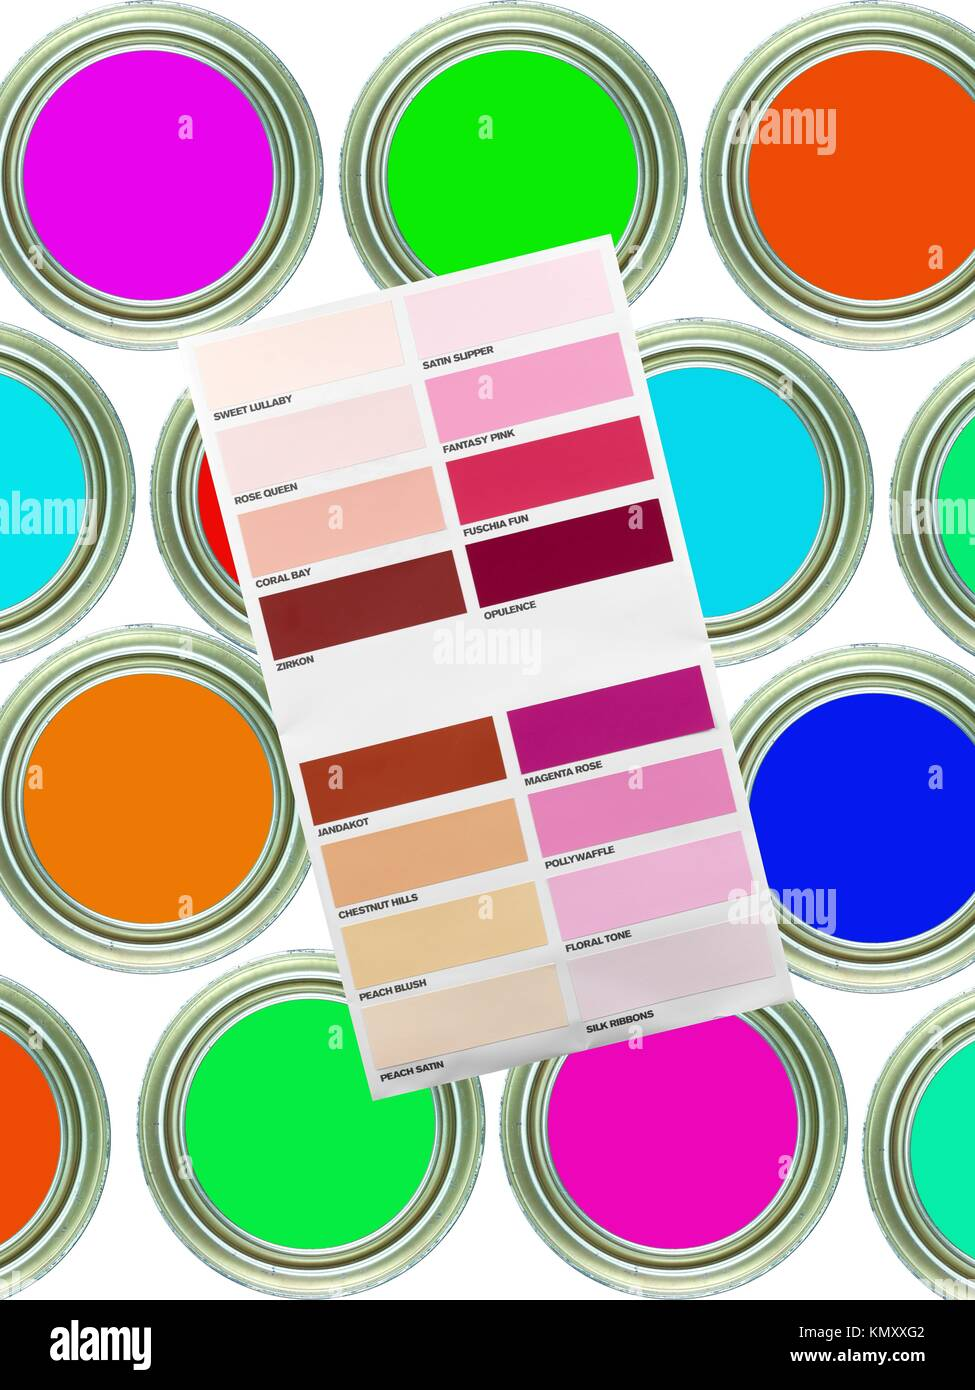 A Cmyk Color Chart Stock Photos A Cmyk Color Chart Stock Images